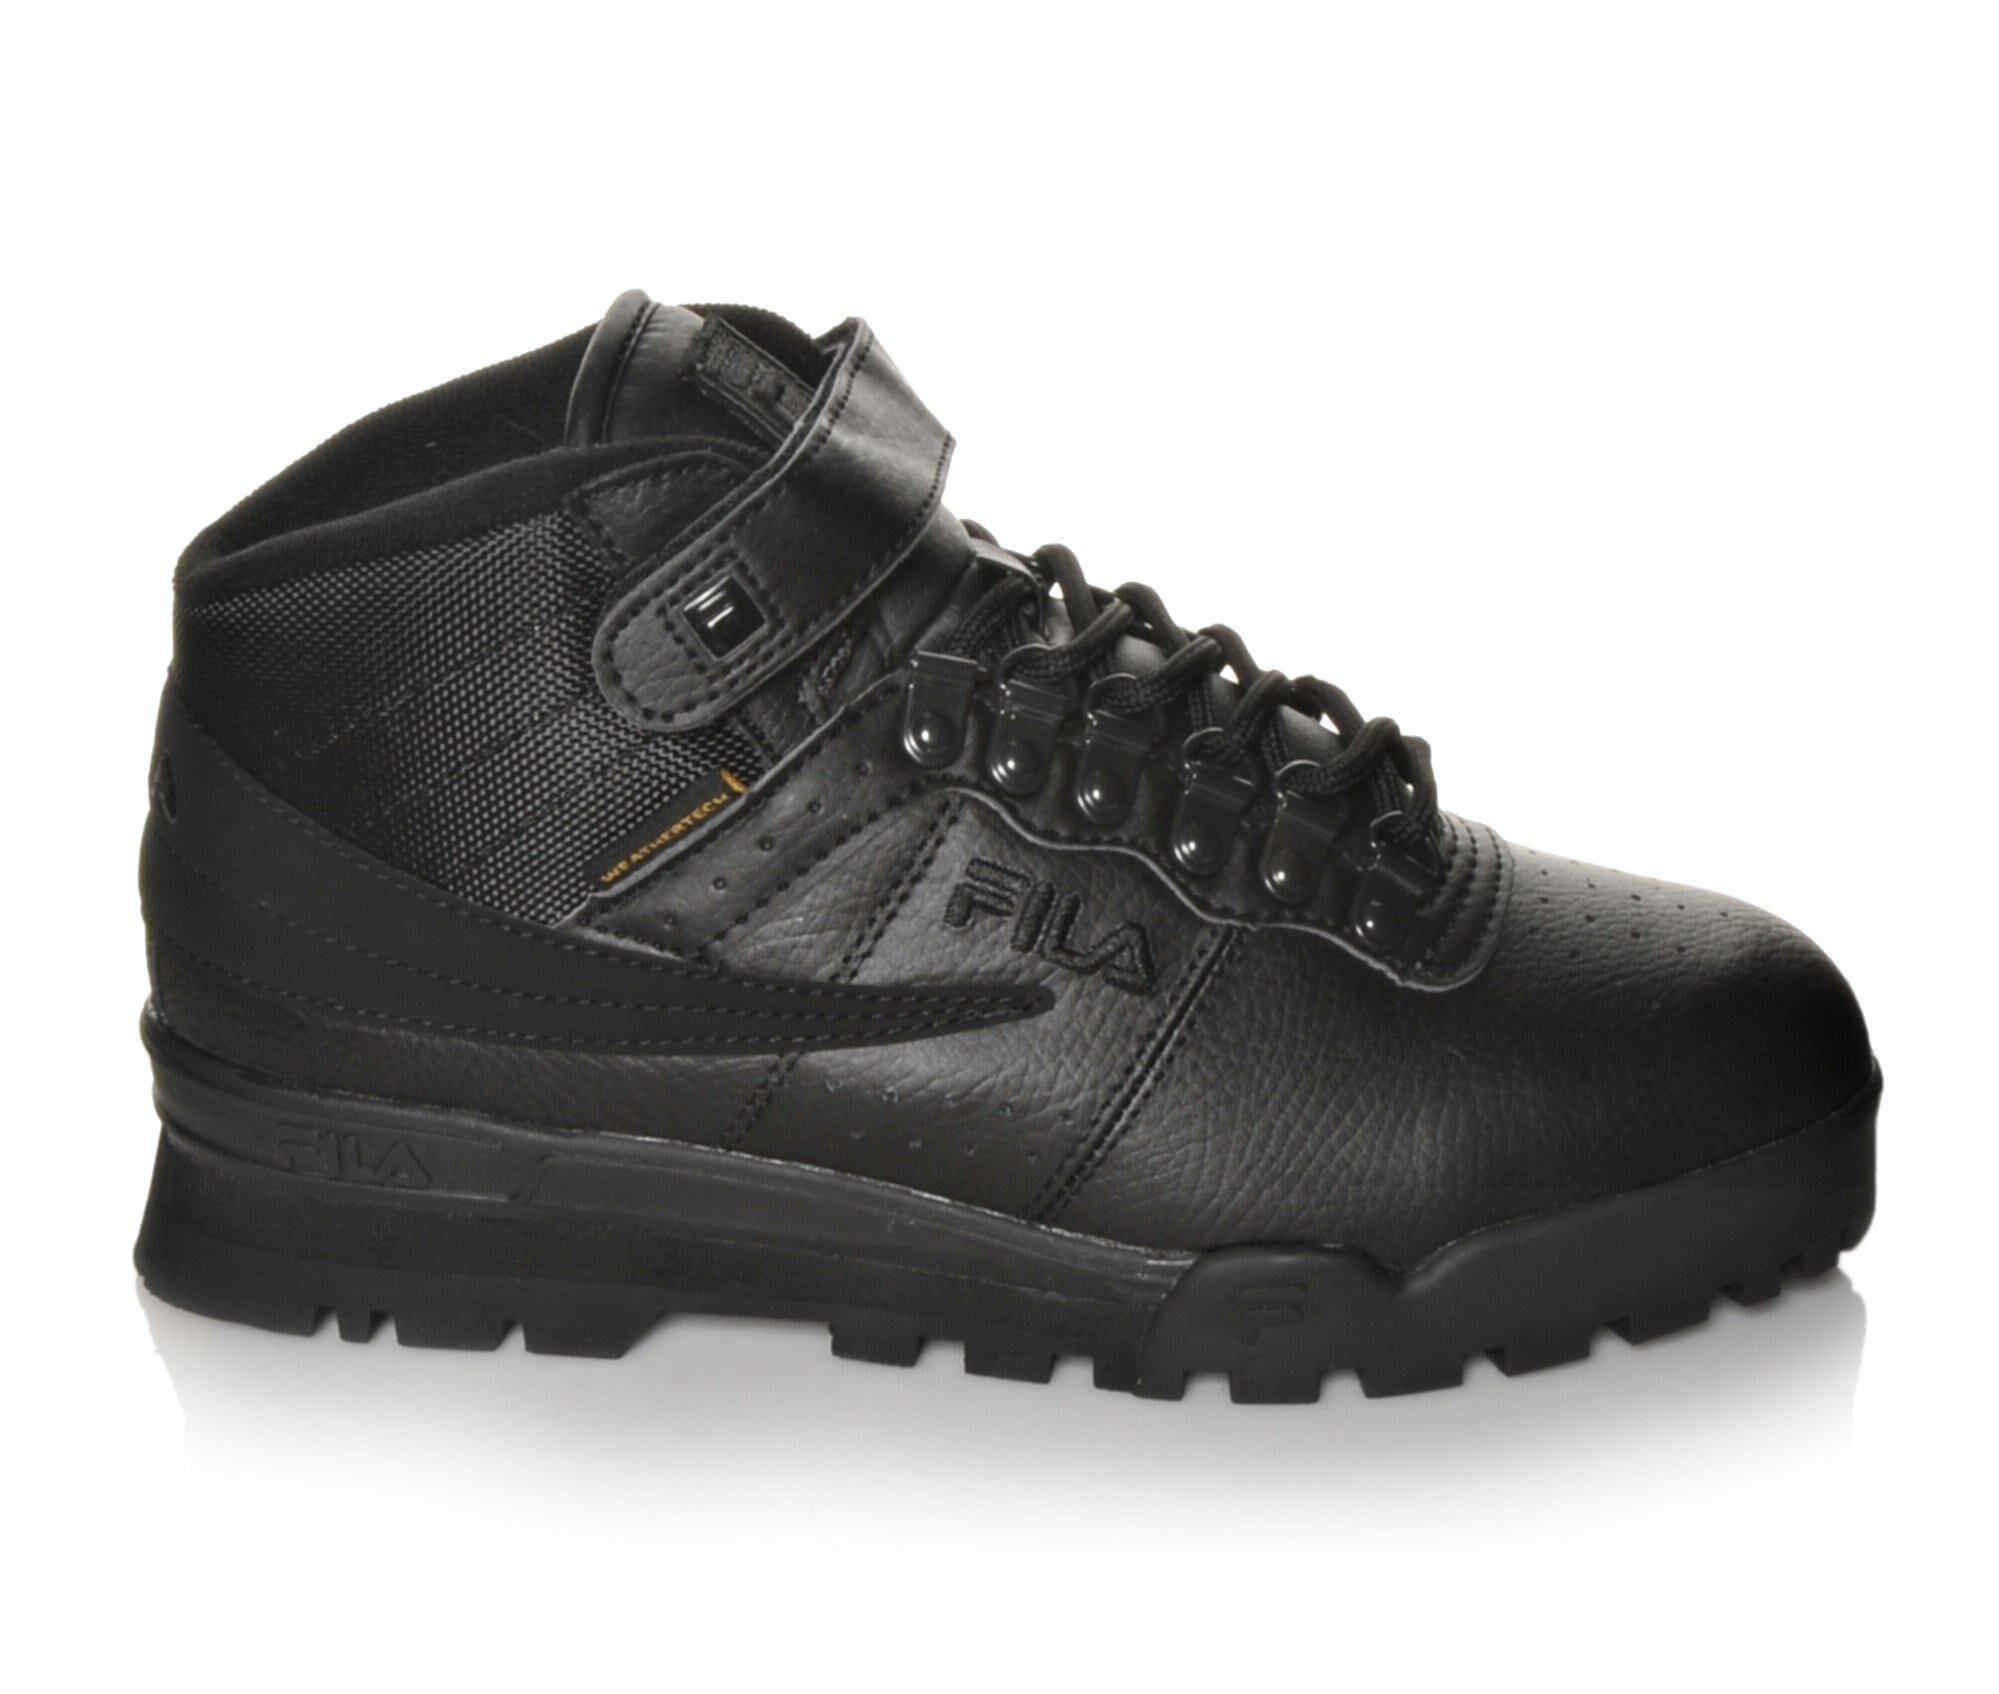 Men's Fila F13 Weathertech Retro Sneakers Black